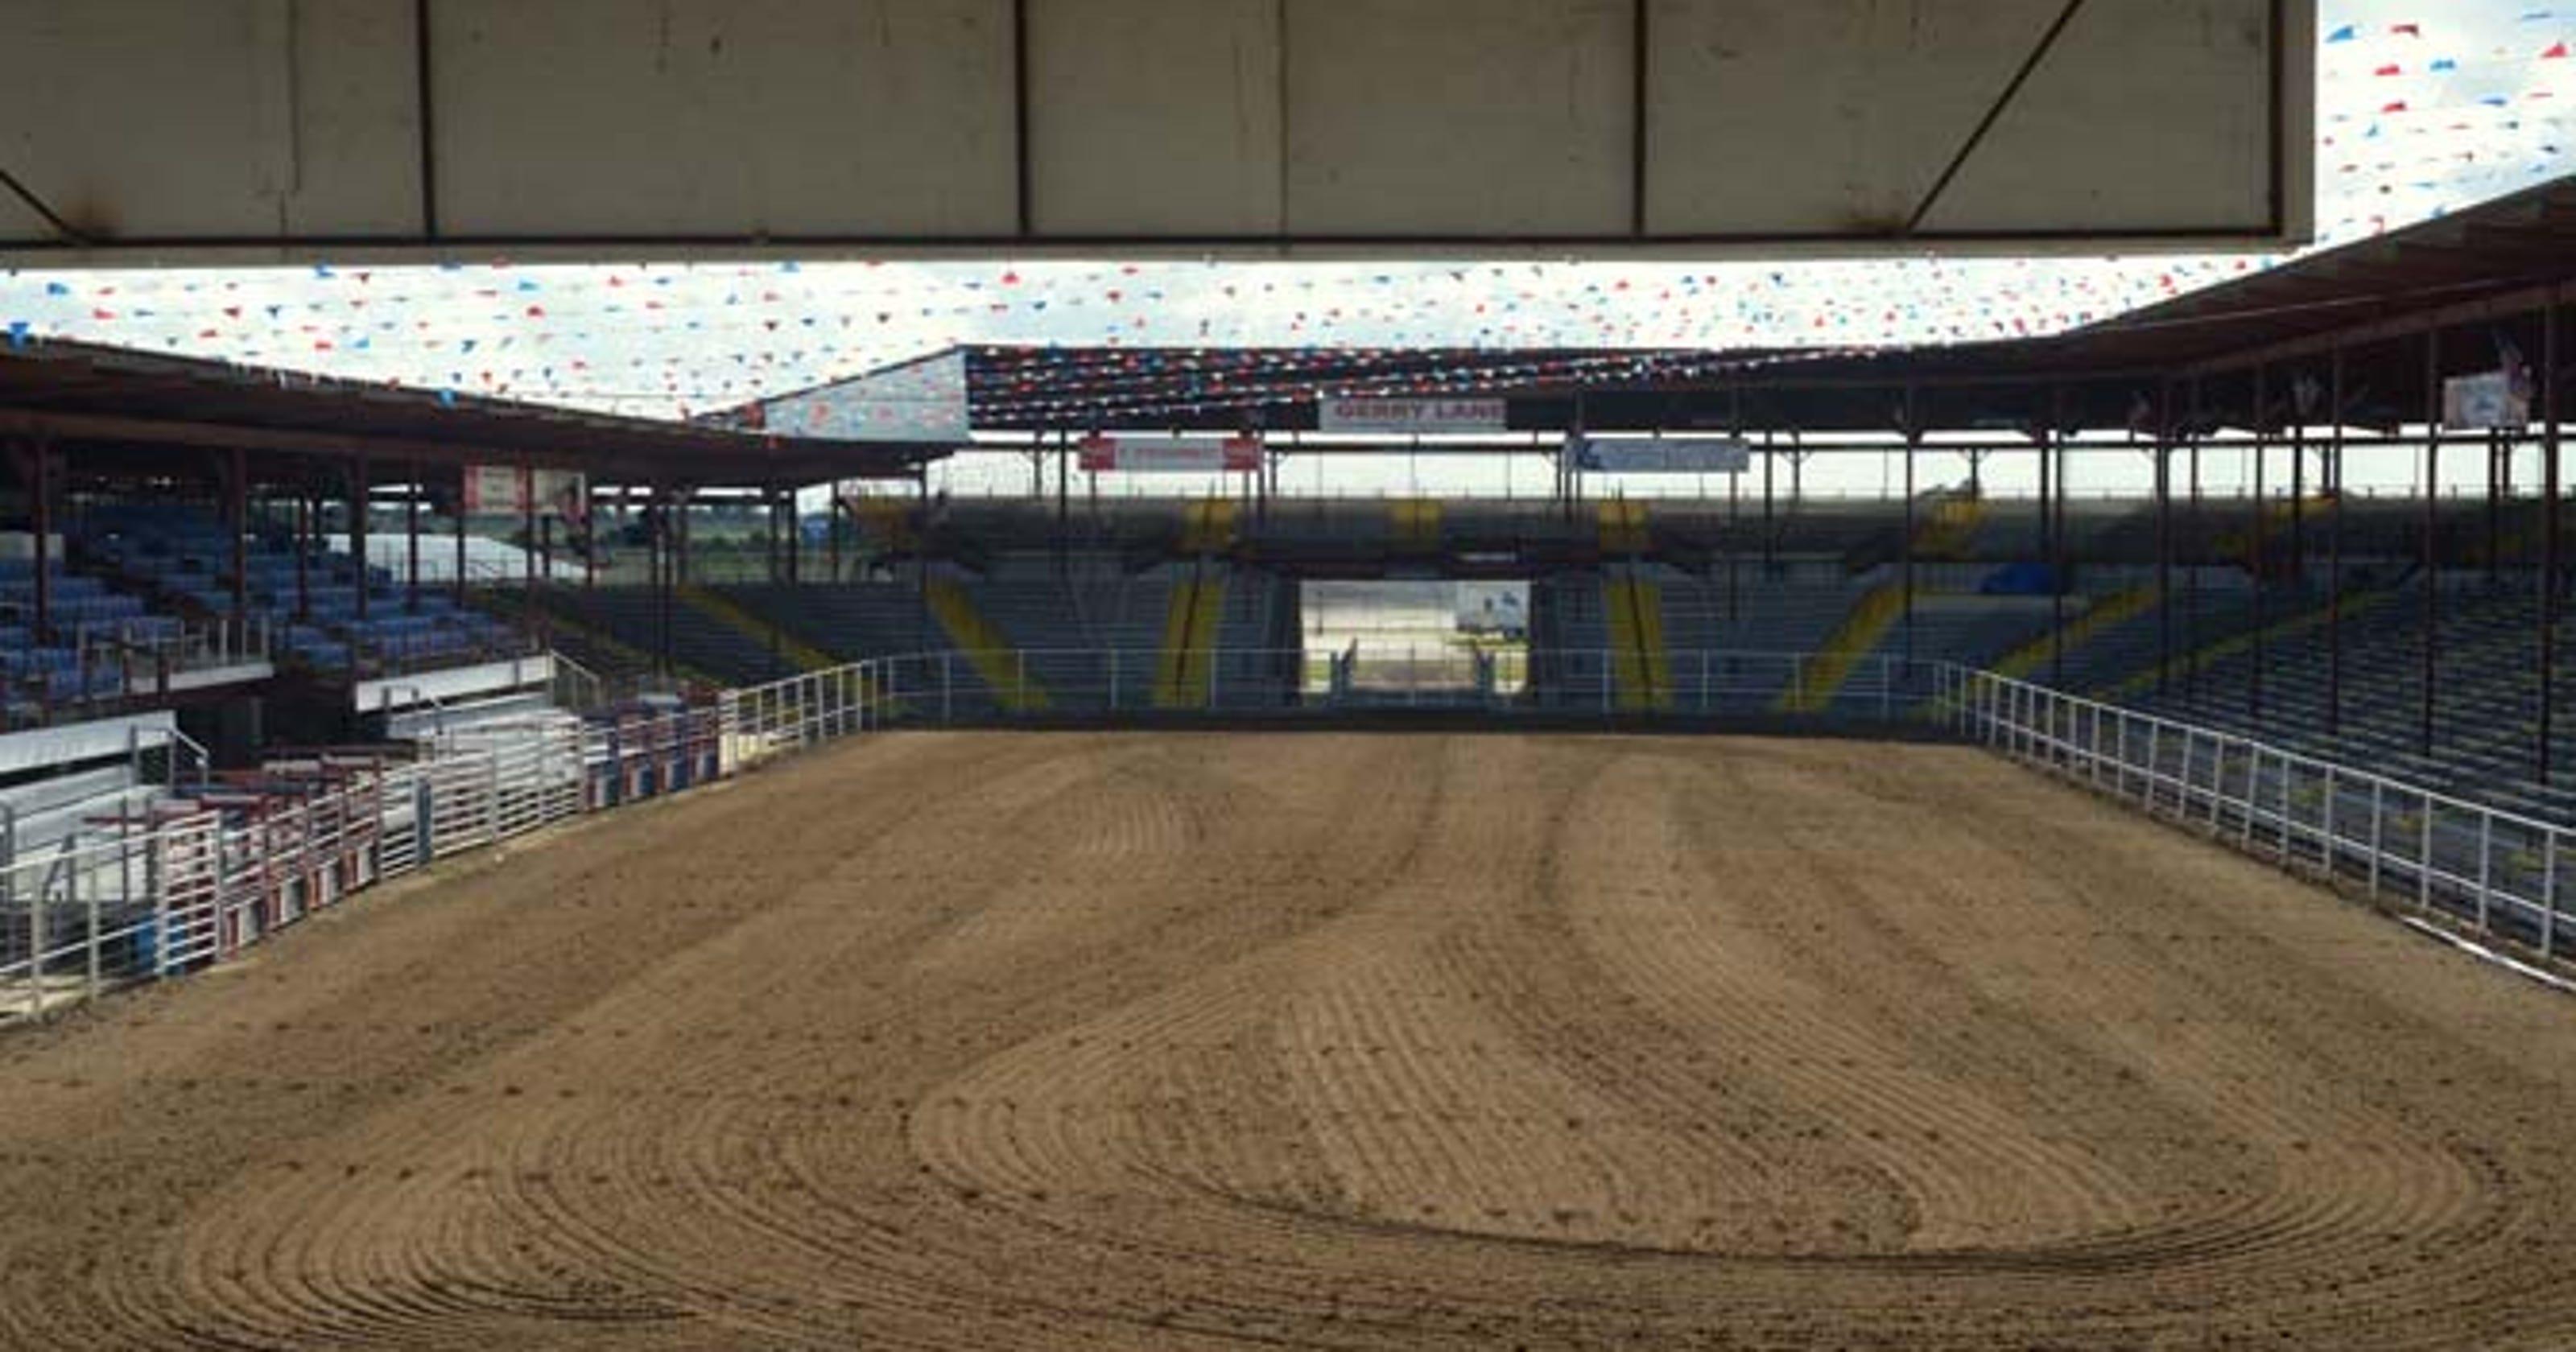 Angola Prison rodeo celebrates 50 years